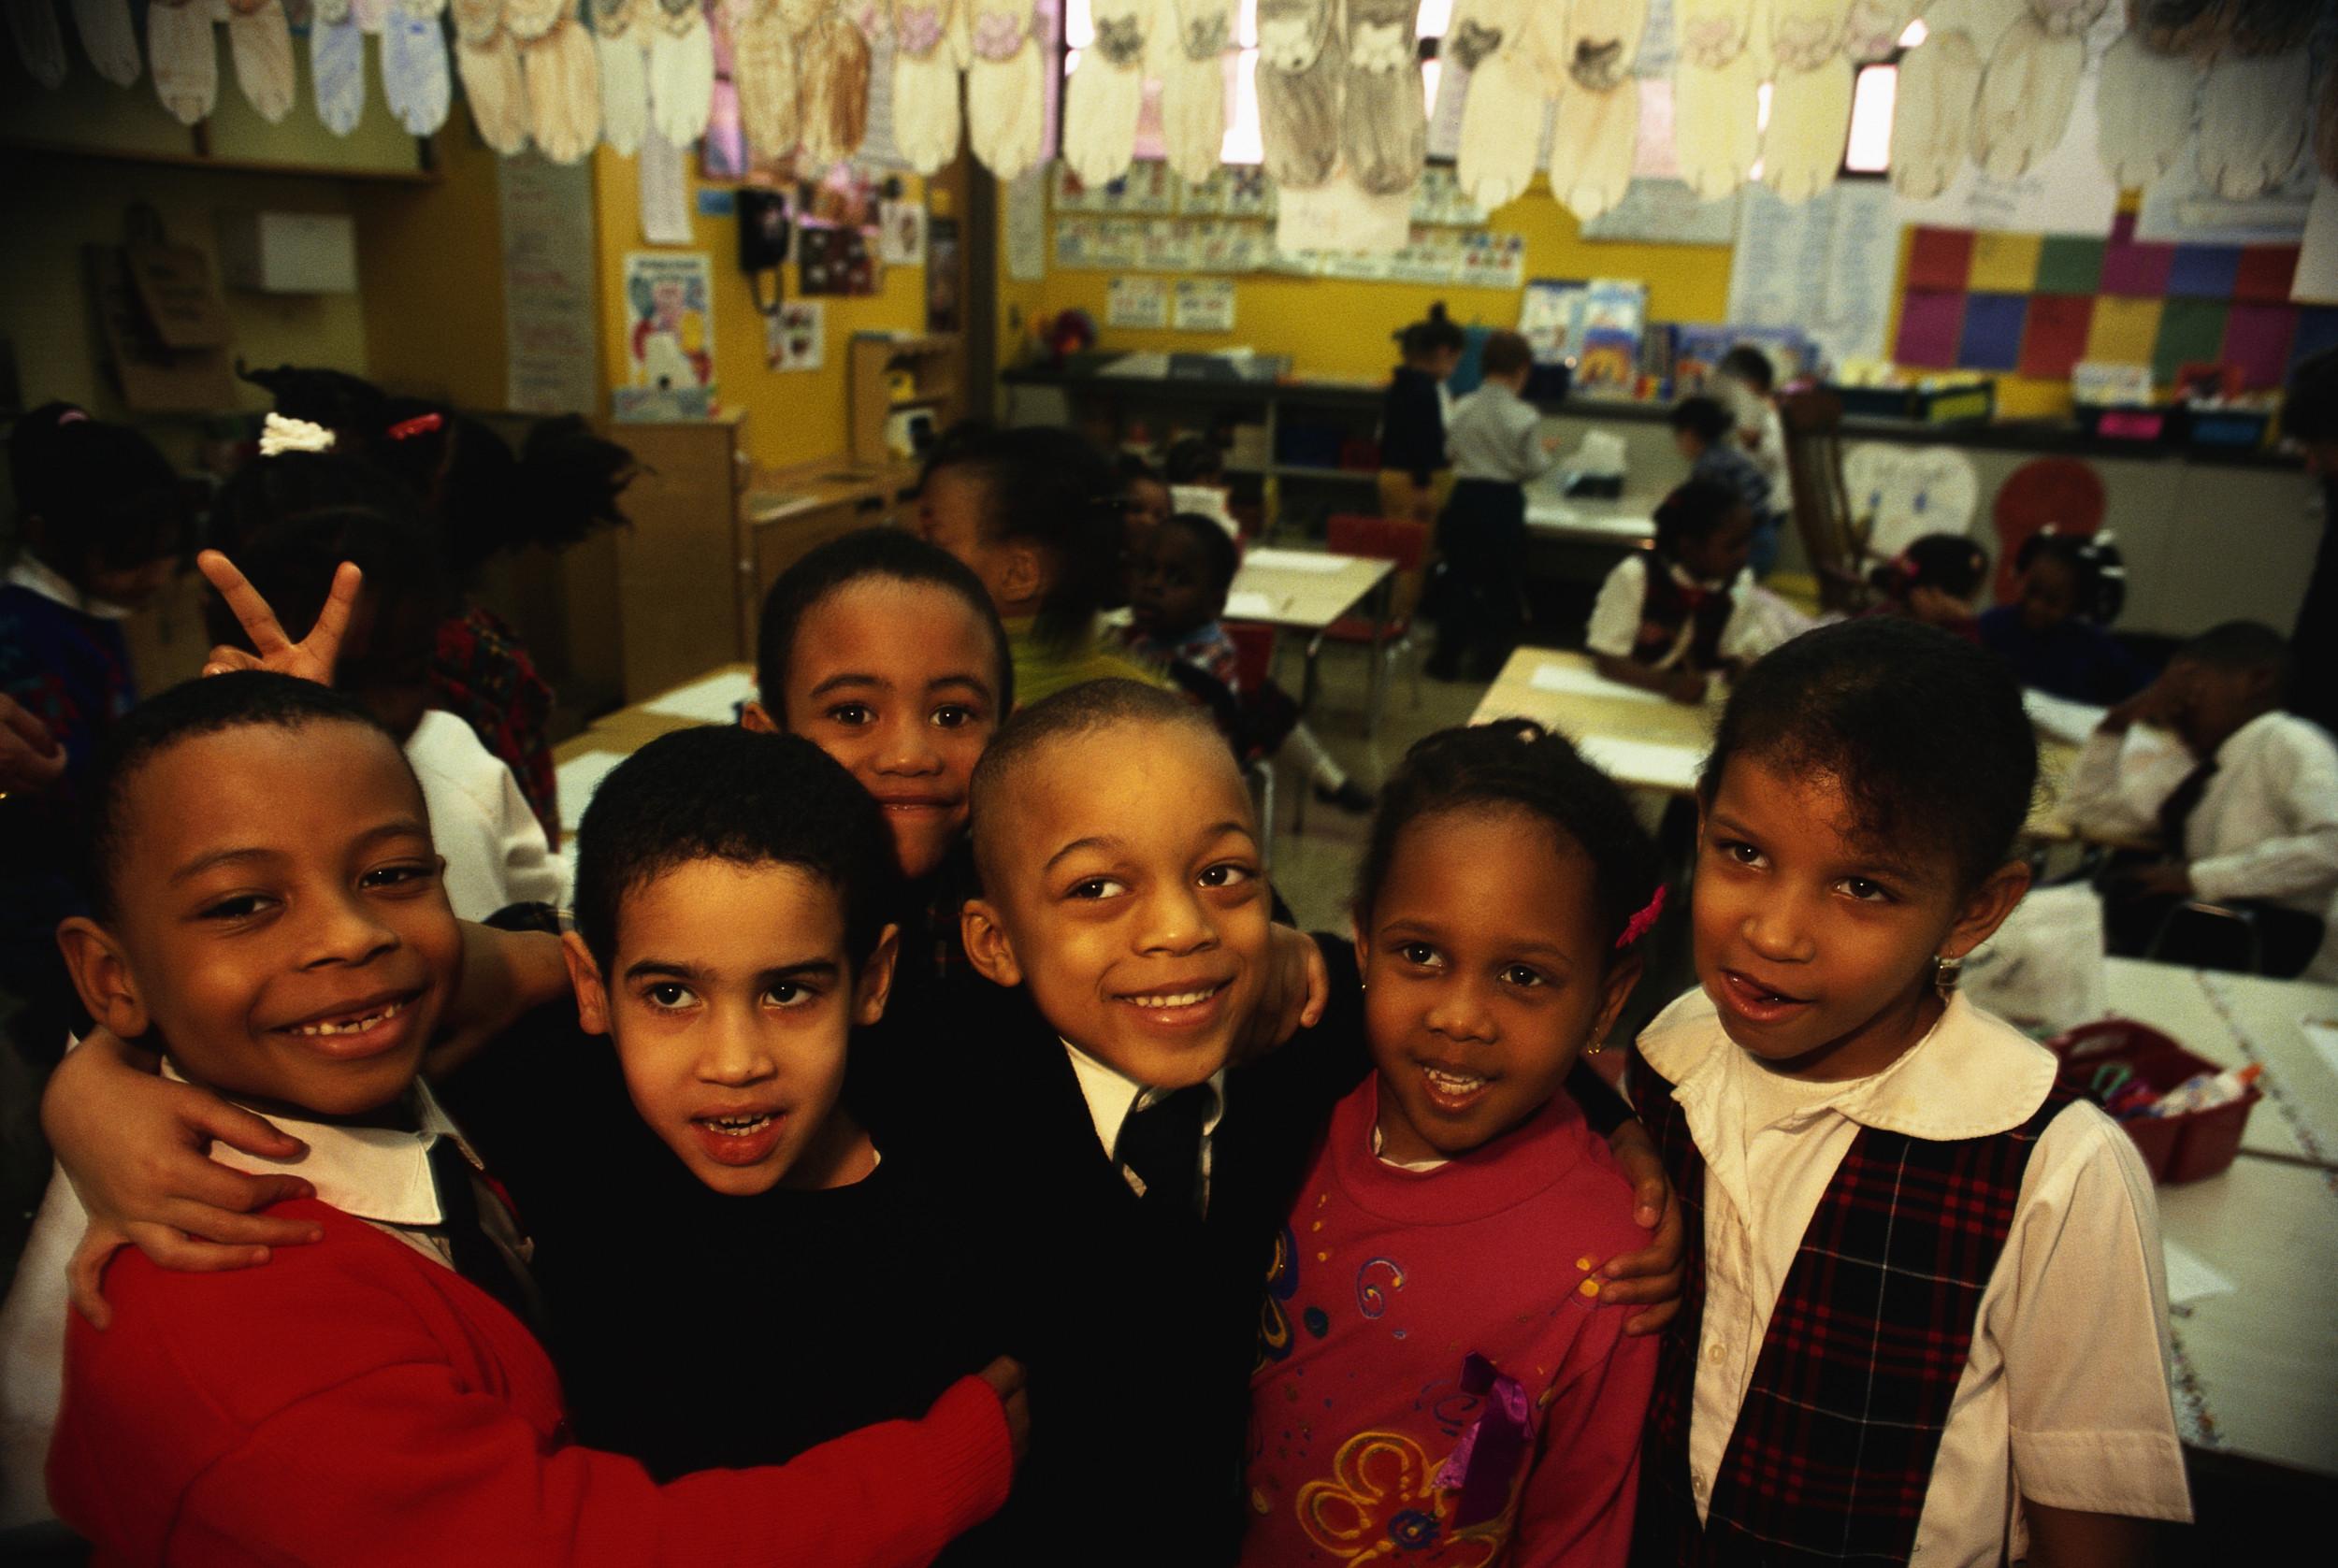 Black children in classroom